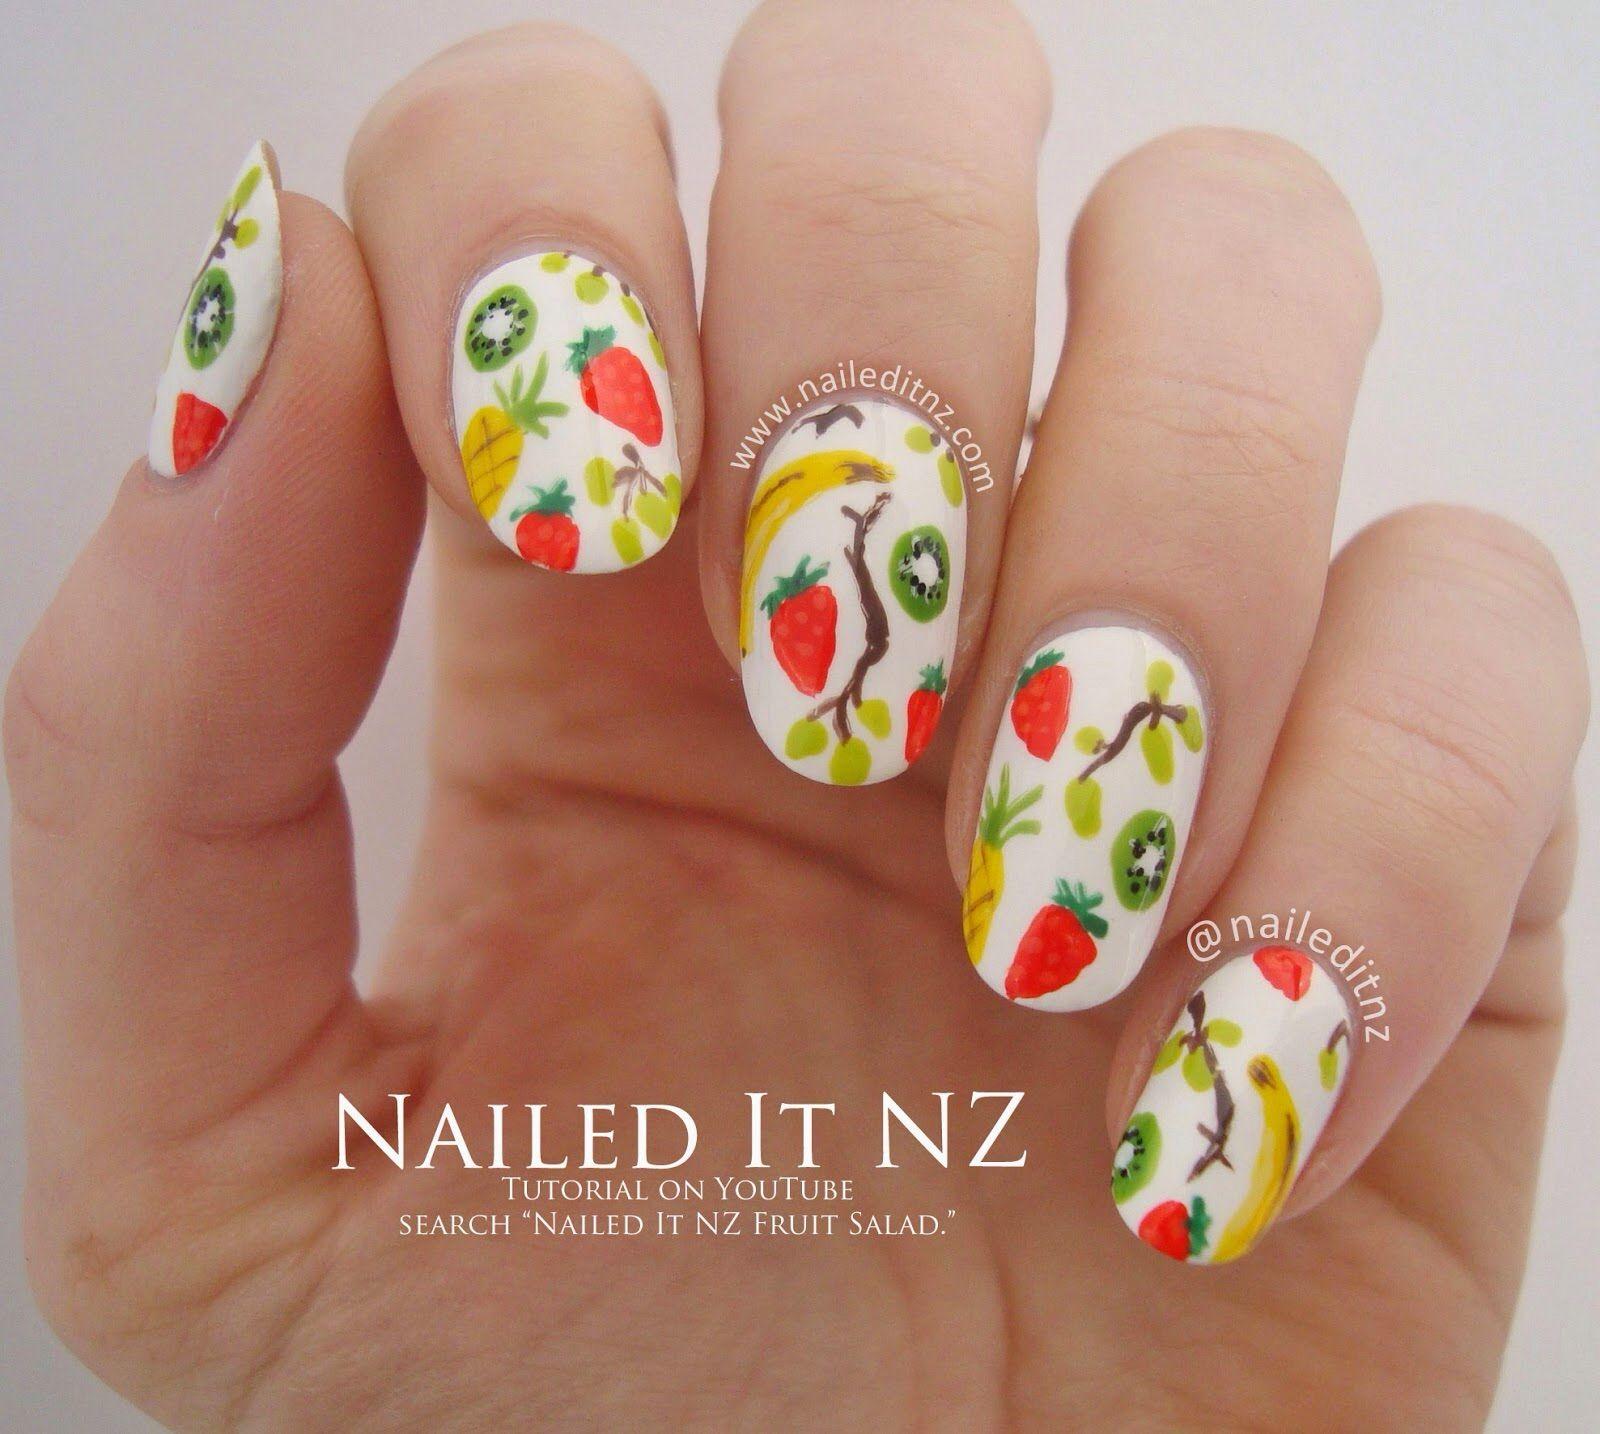 Nailed It NZ cute fruity nail designs   Fruity nail designs   Pinterest